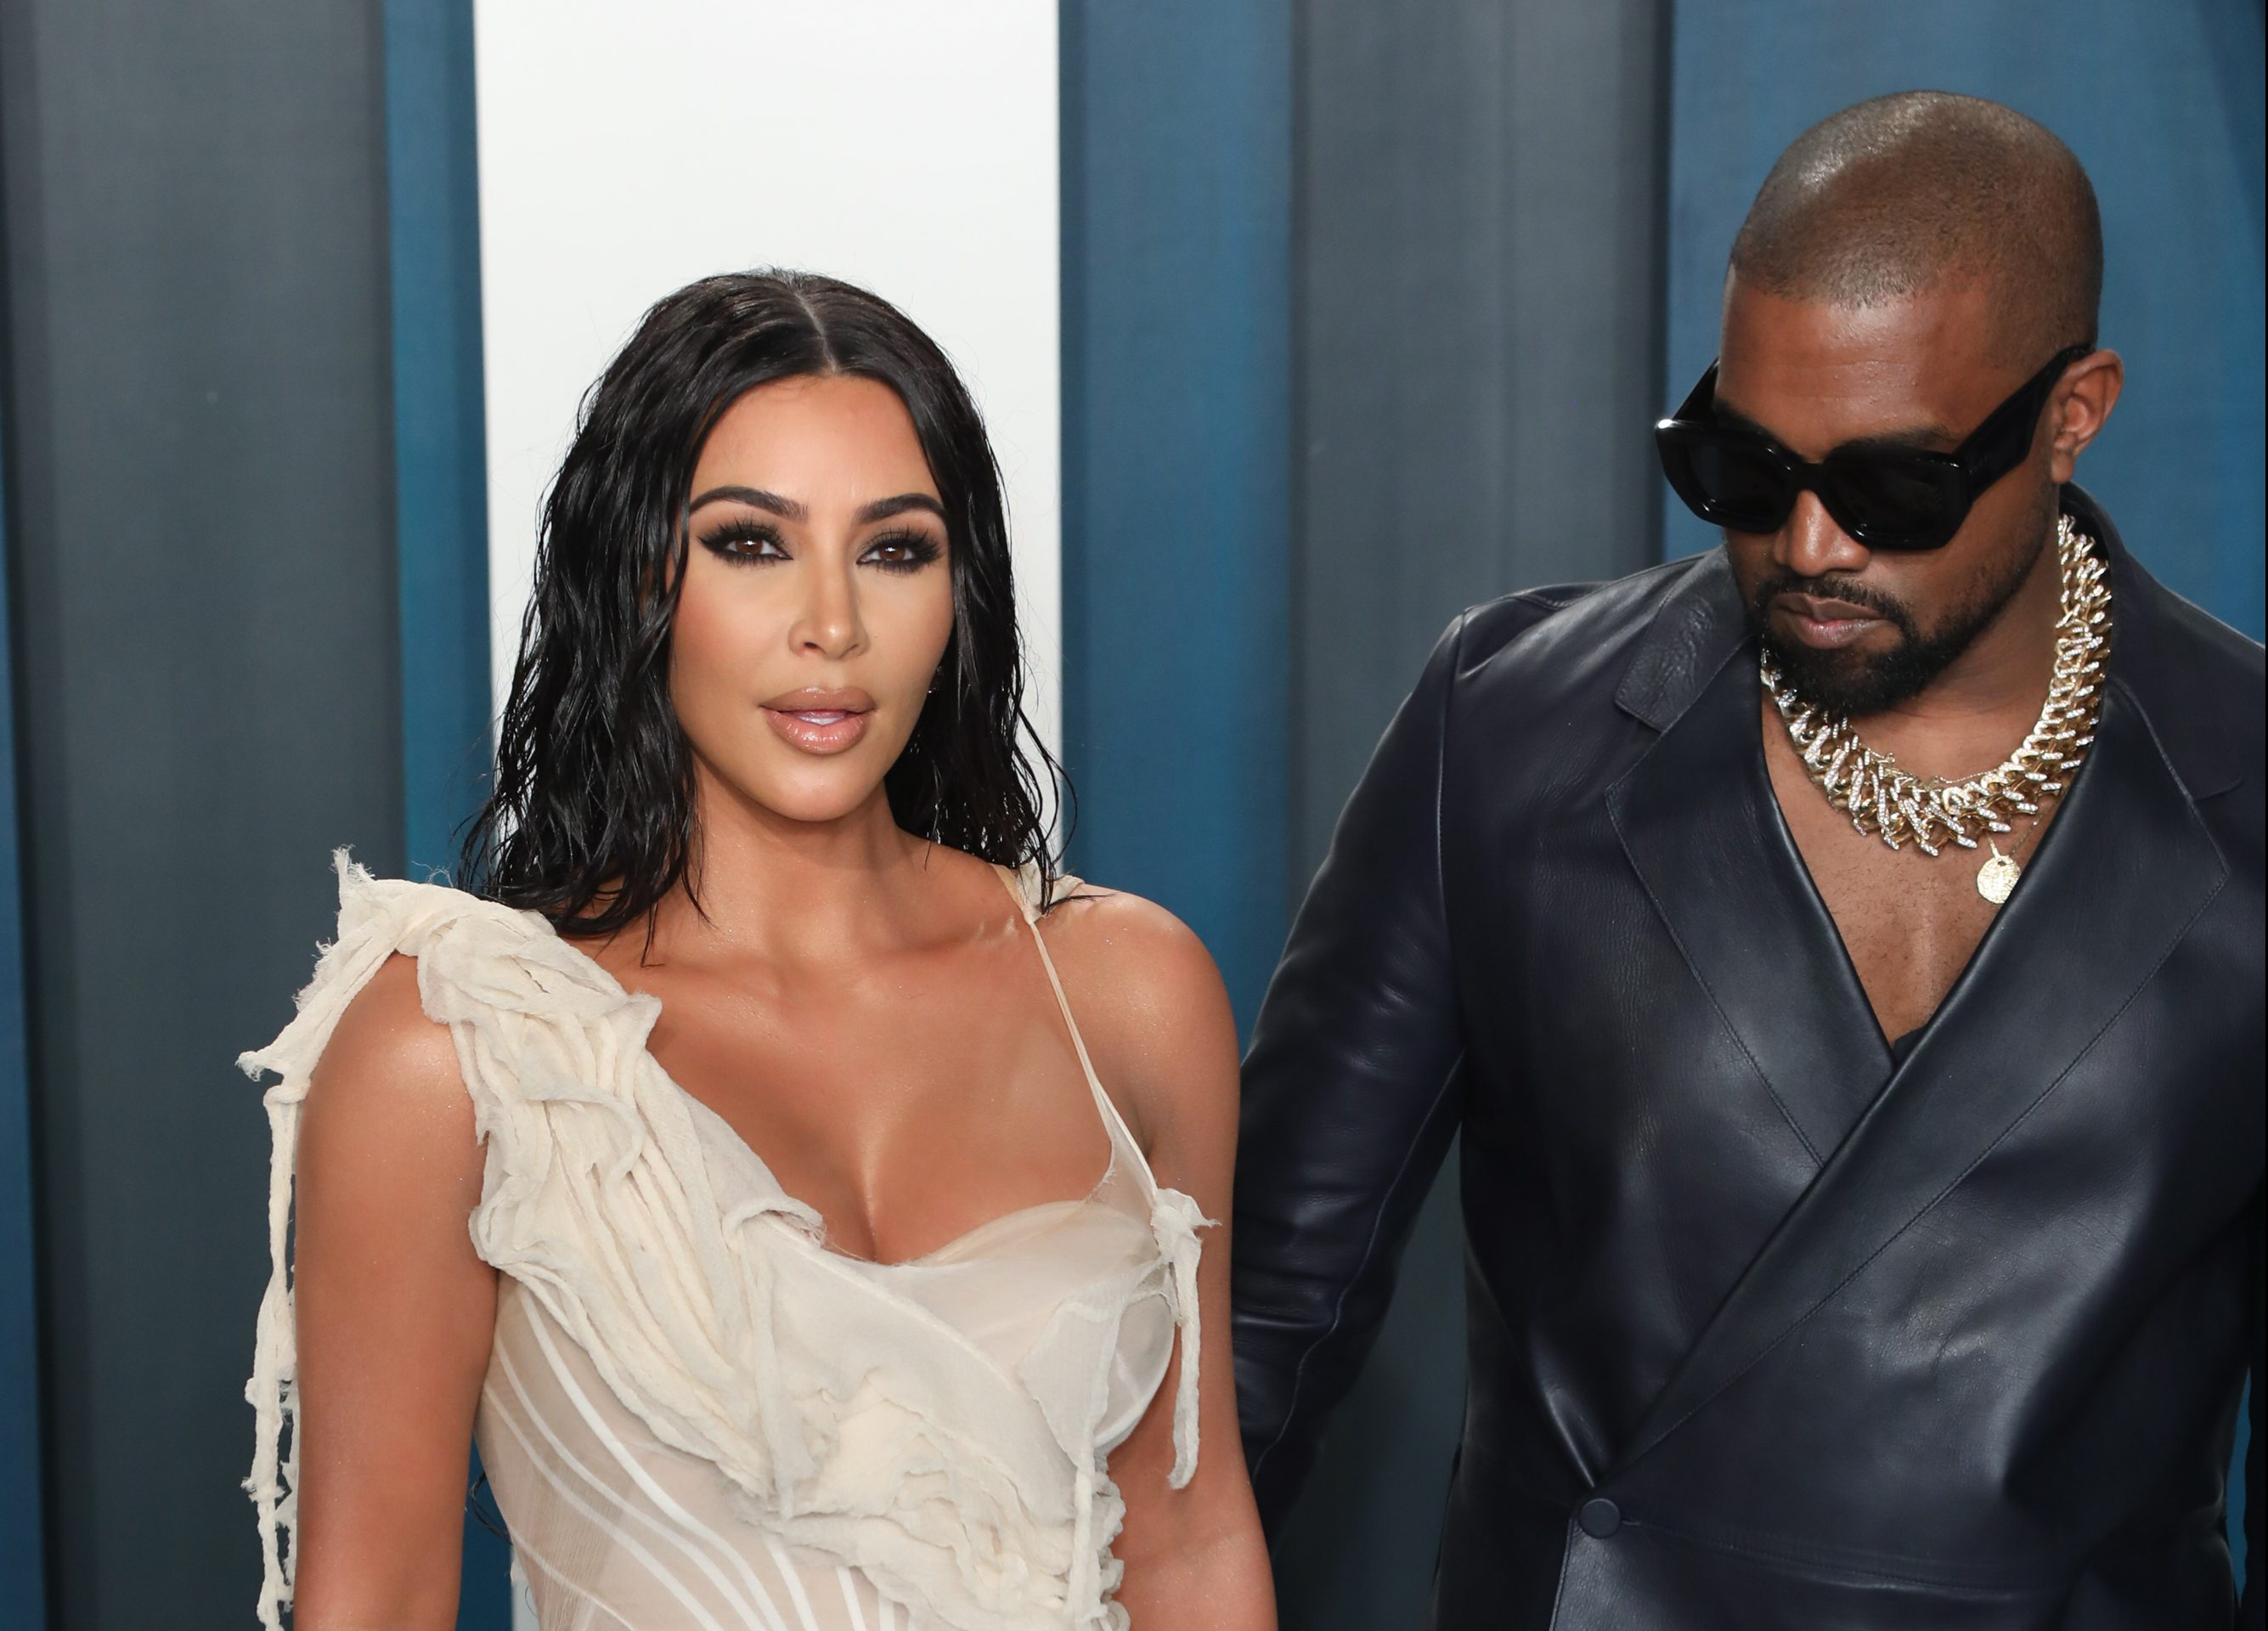 You Care: Kanye West Unfollows Kim Kardashian & Her Sisters On Social Media